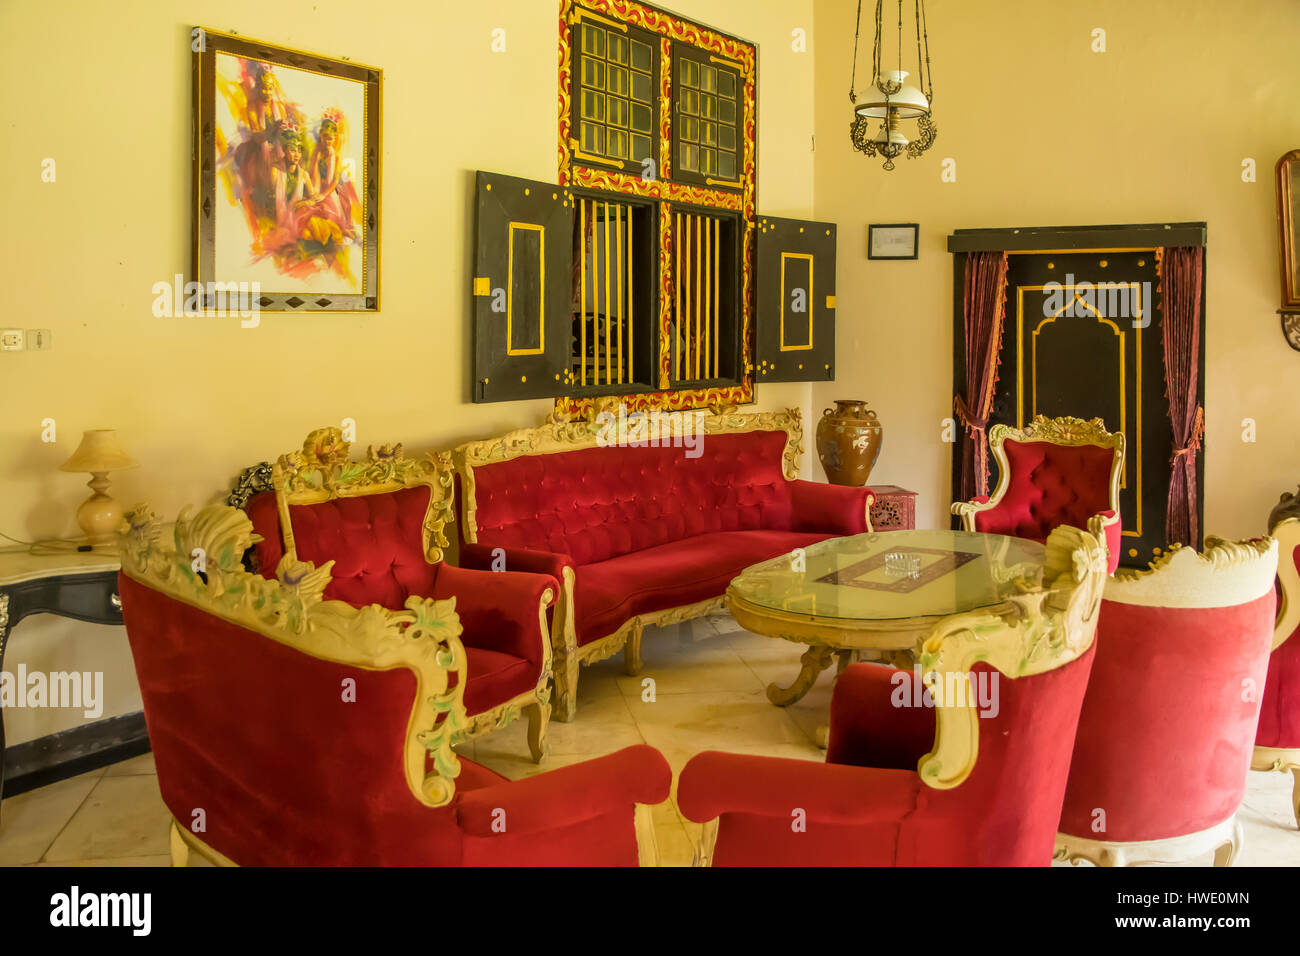 Sitting Room in Keraton Royal Palace, Sumenep, Madura, Indonesia - Stock Image